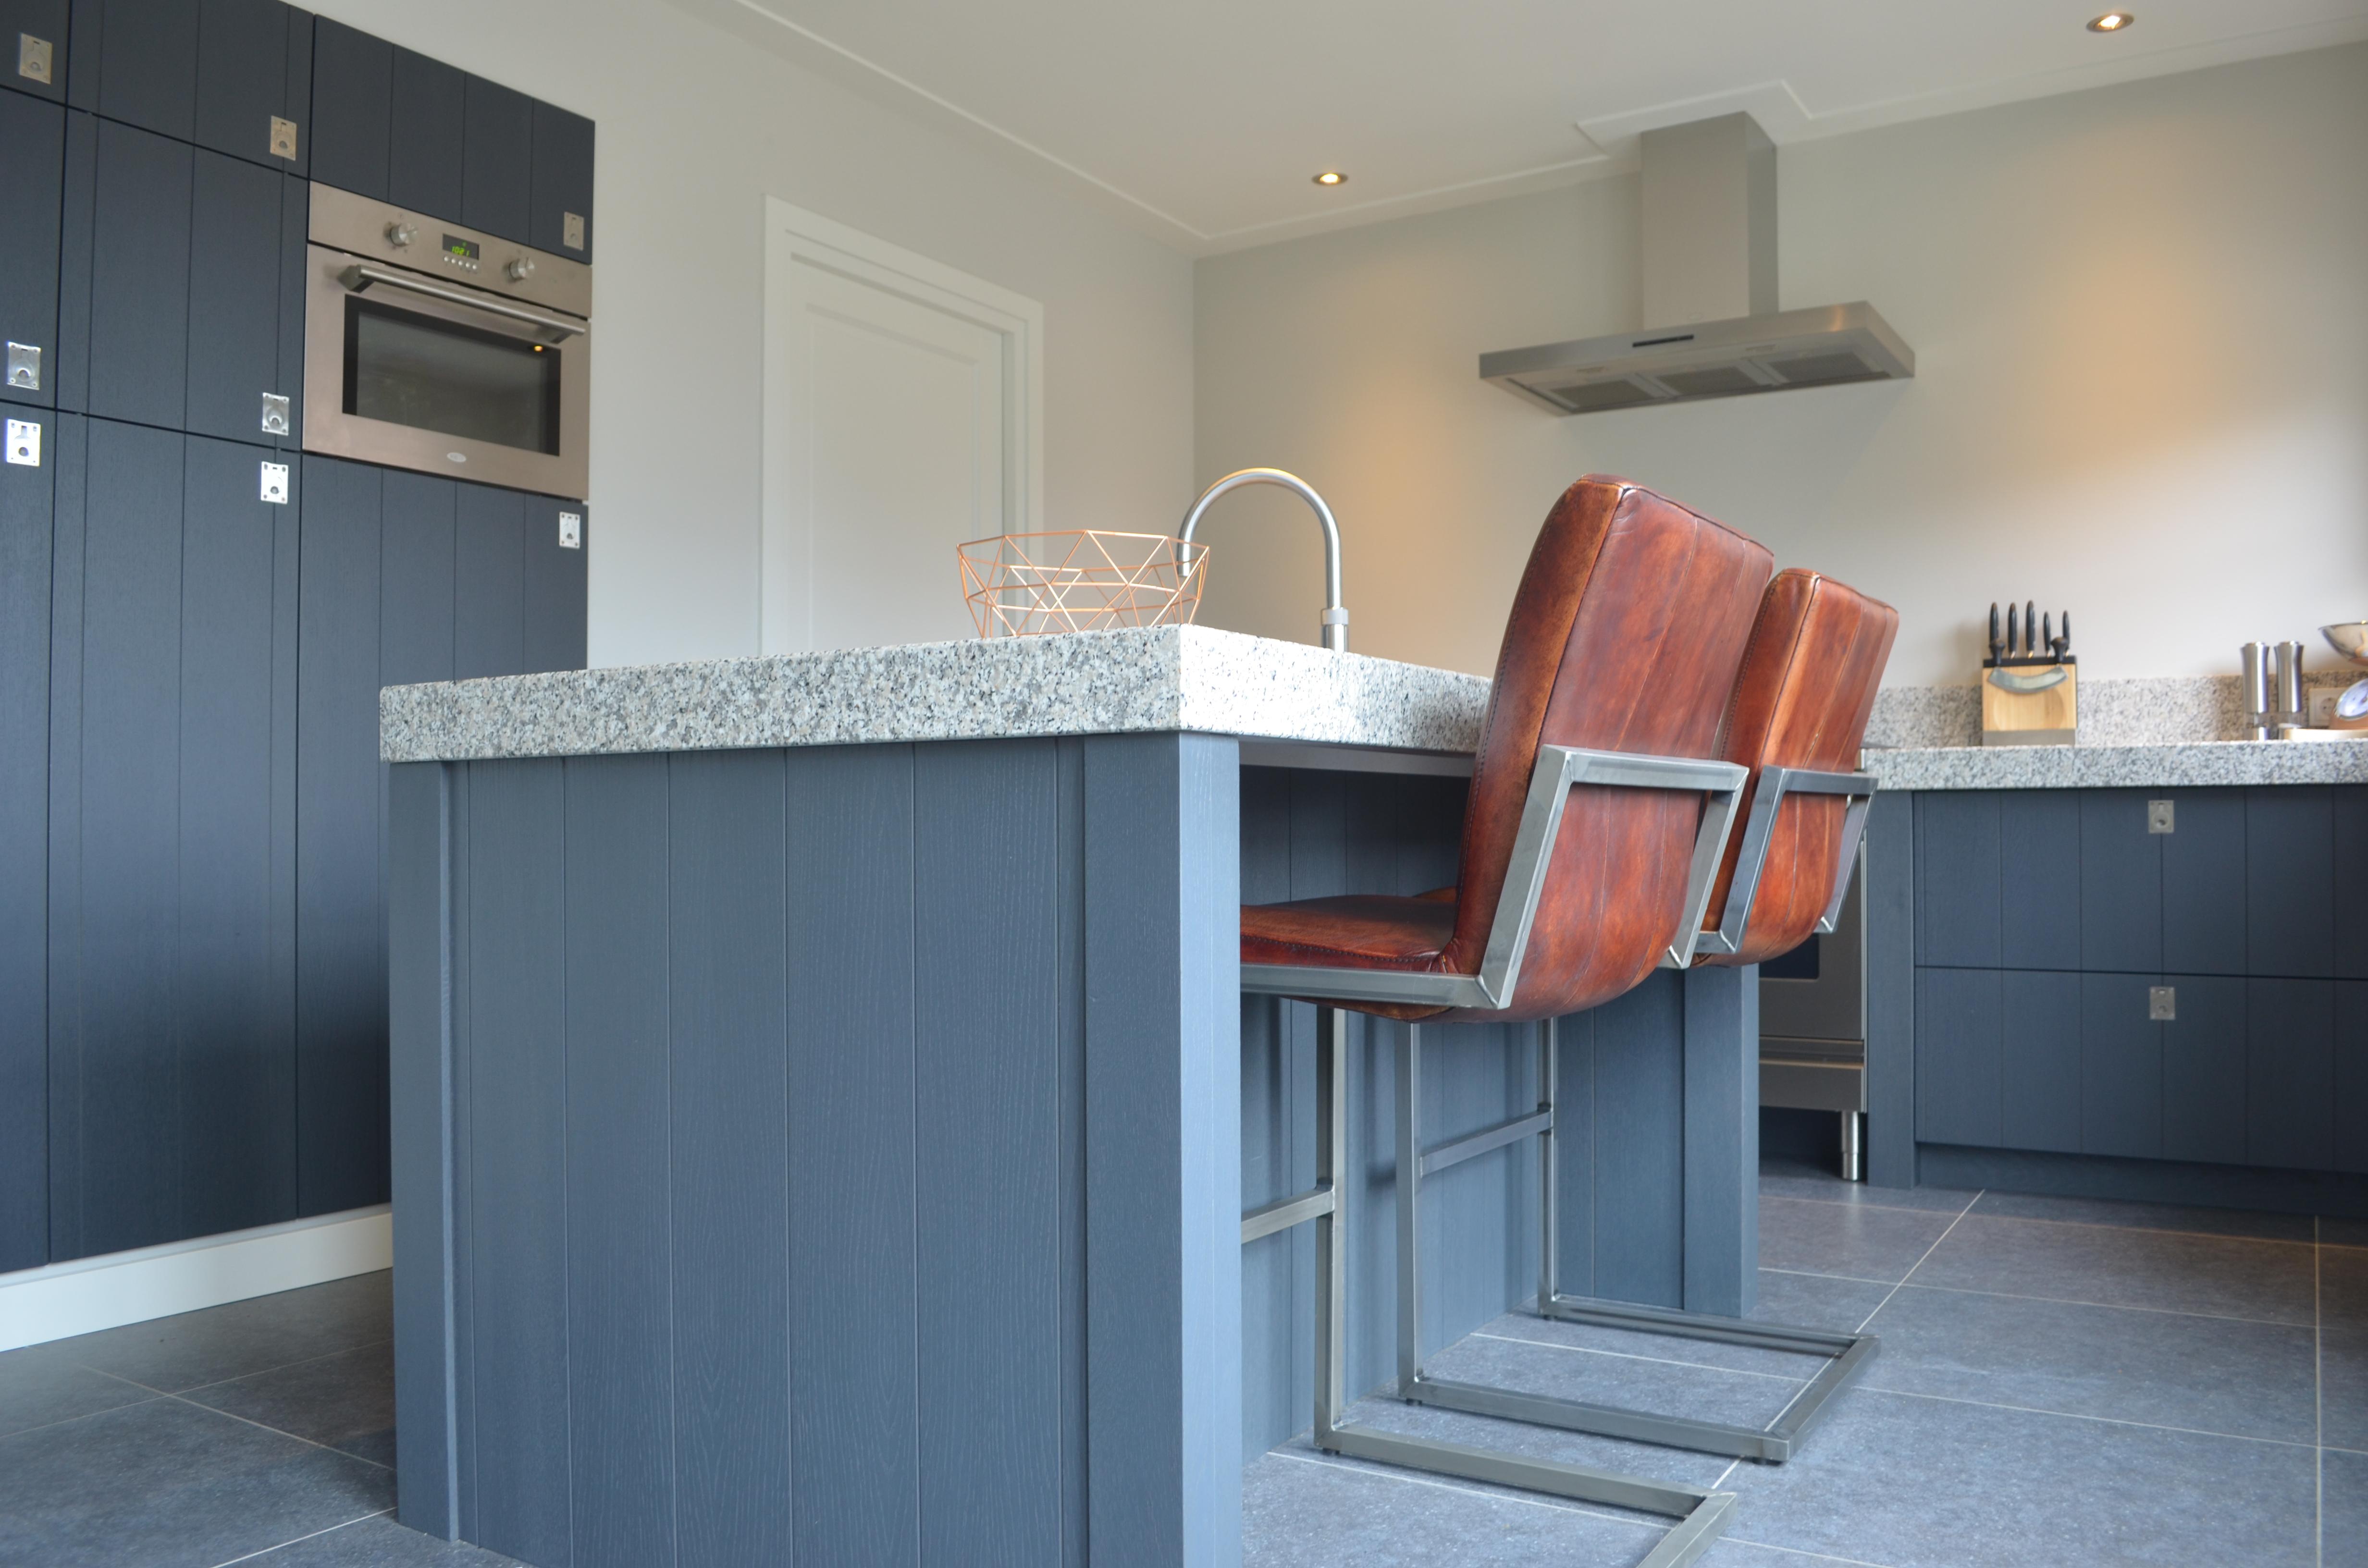 Keuken Landelijk Grijze : Keuken landelijk grijs van kaathoven interieurbouw